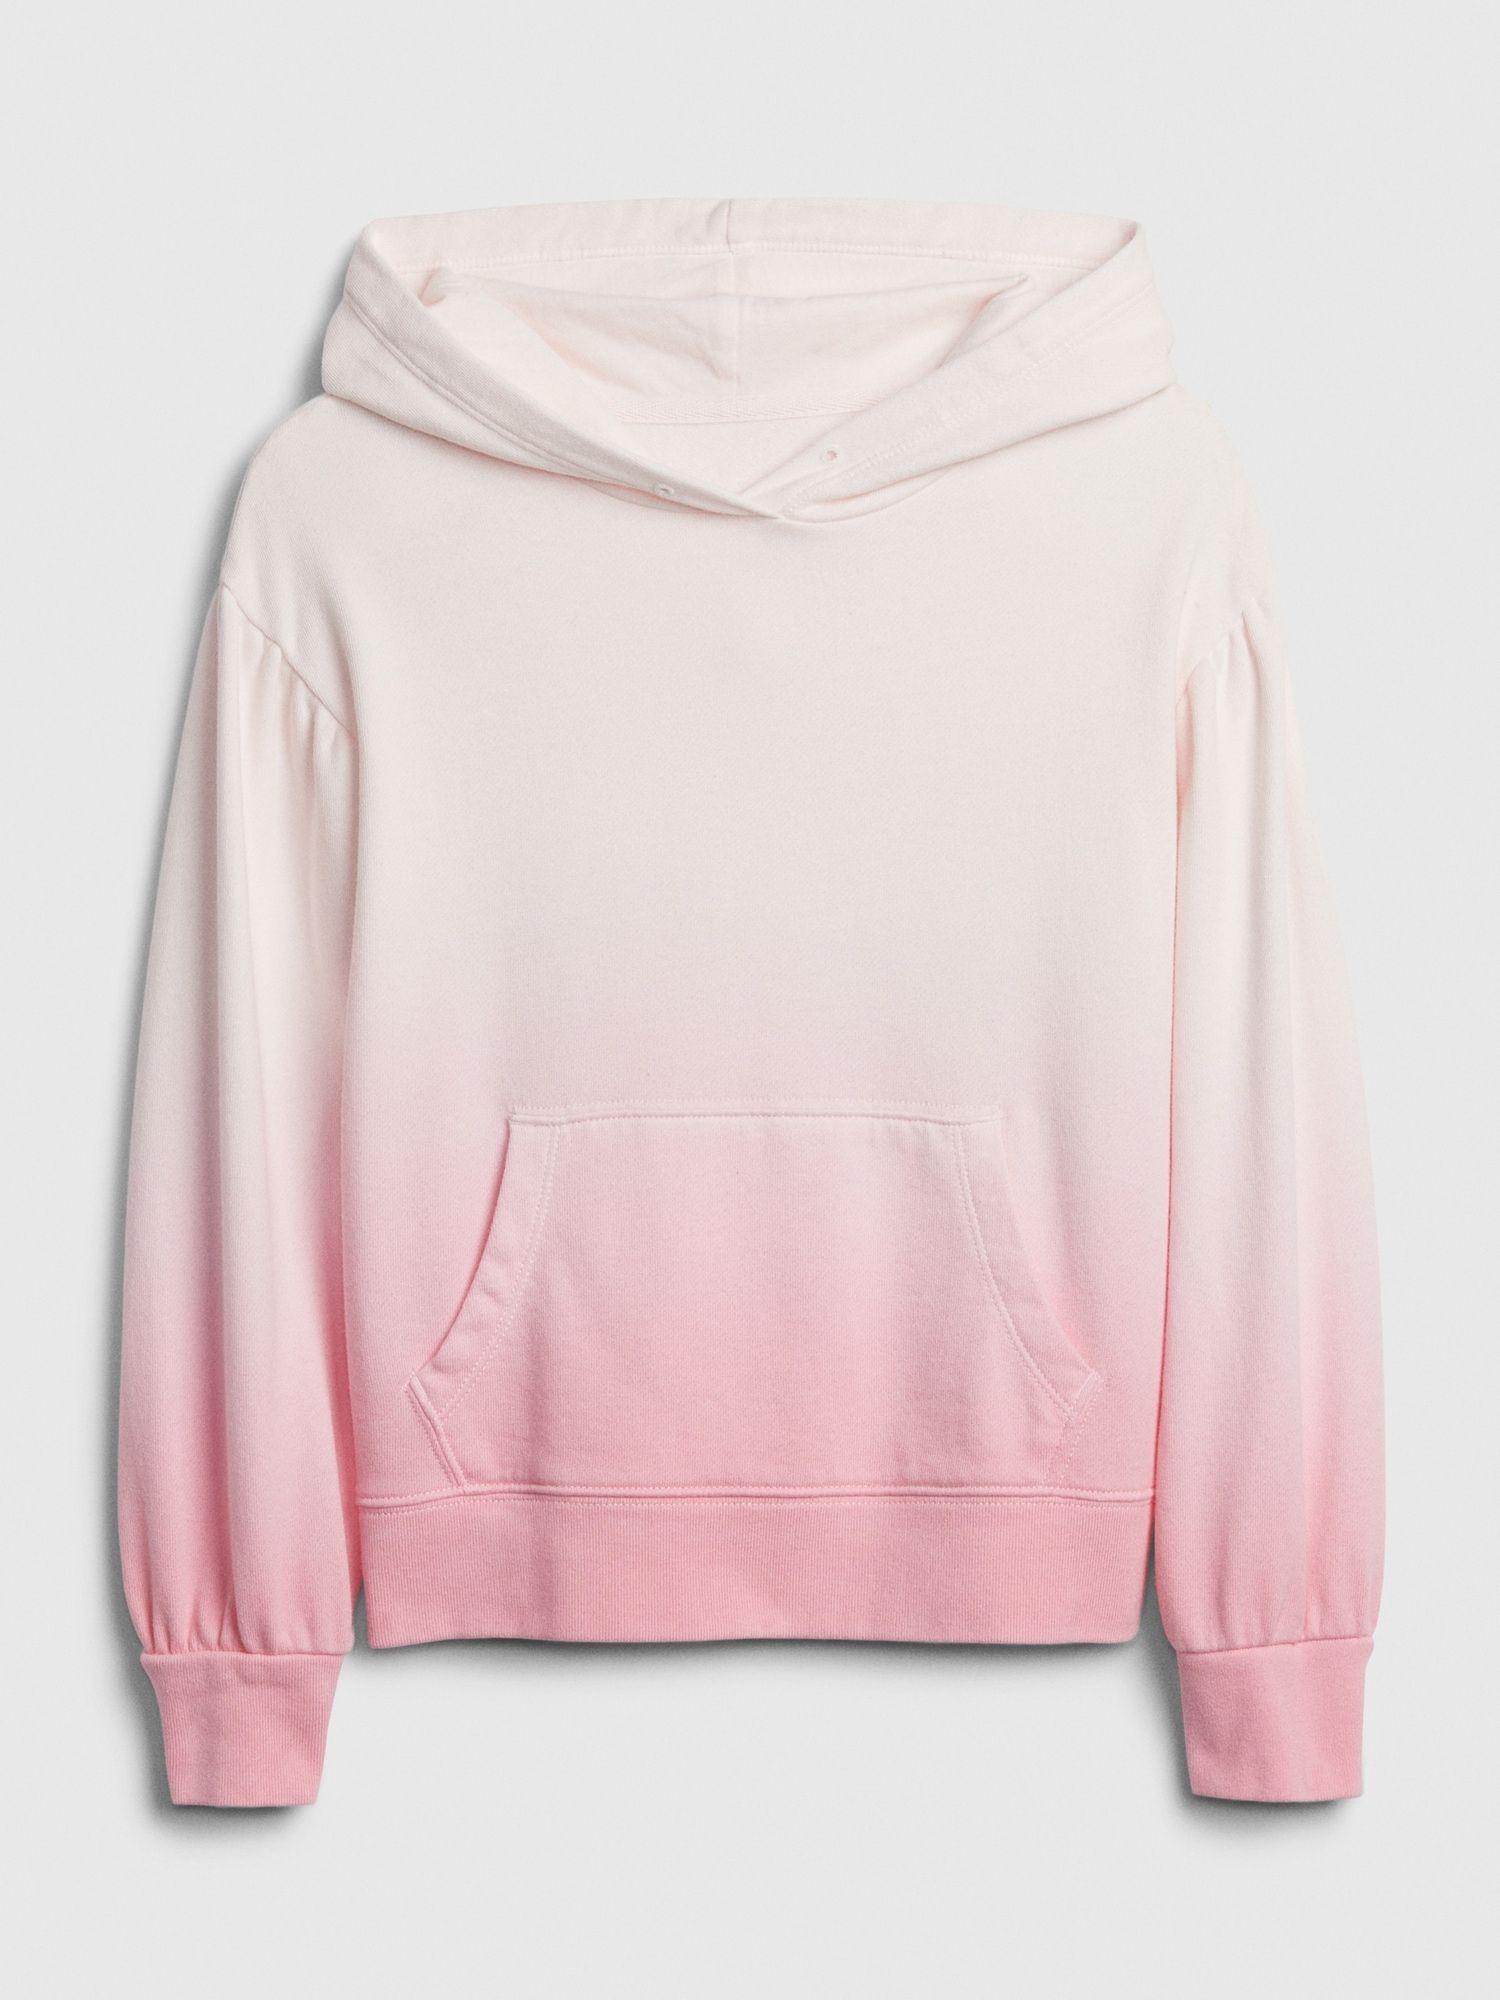 Gap Kids Ombre Hoodie T Shirt Pink Dip Dye Tween Outfits Hoodies Tie Dye Fashion [ 2000 x 1500 Pixel ]